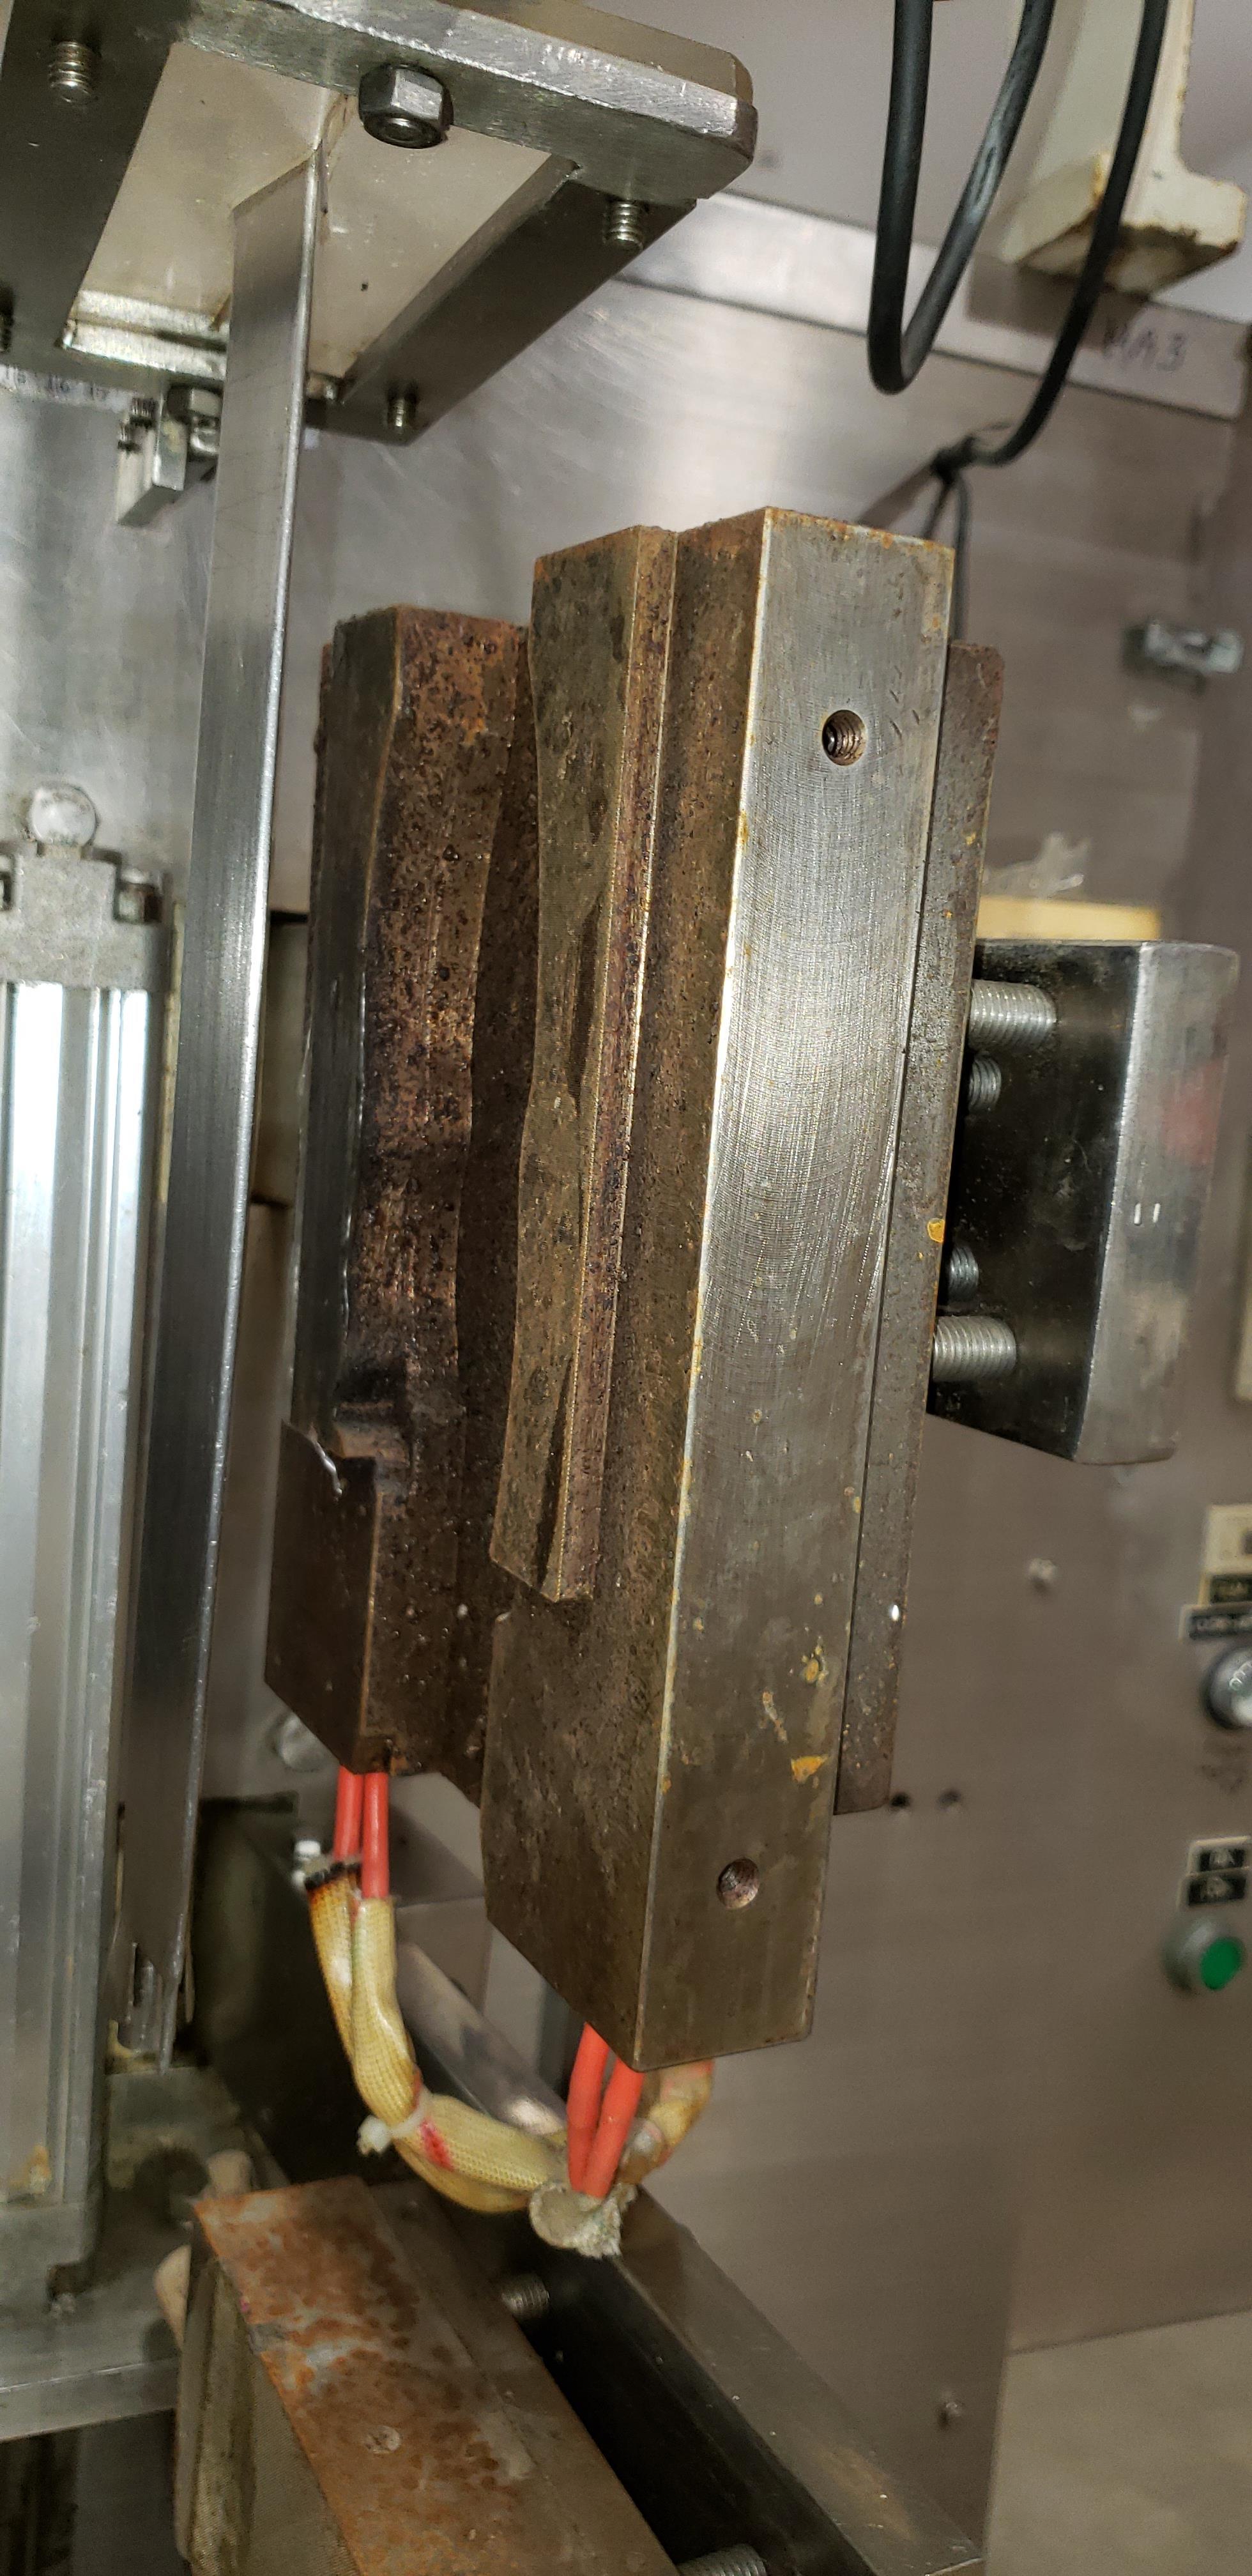 SAVPAK VERTICAL FORM FILL & SEAL MACHINE - Image 7 of 19